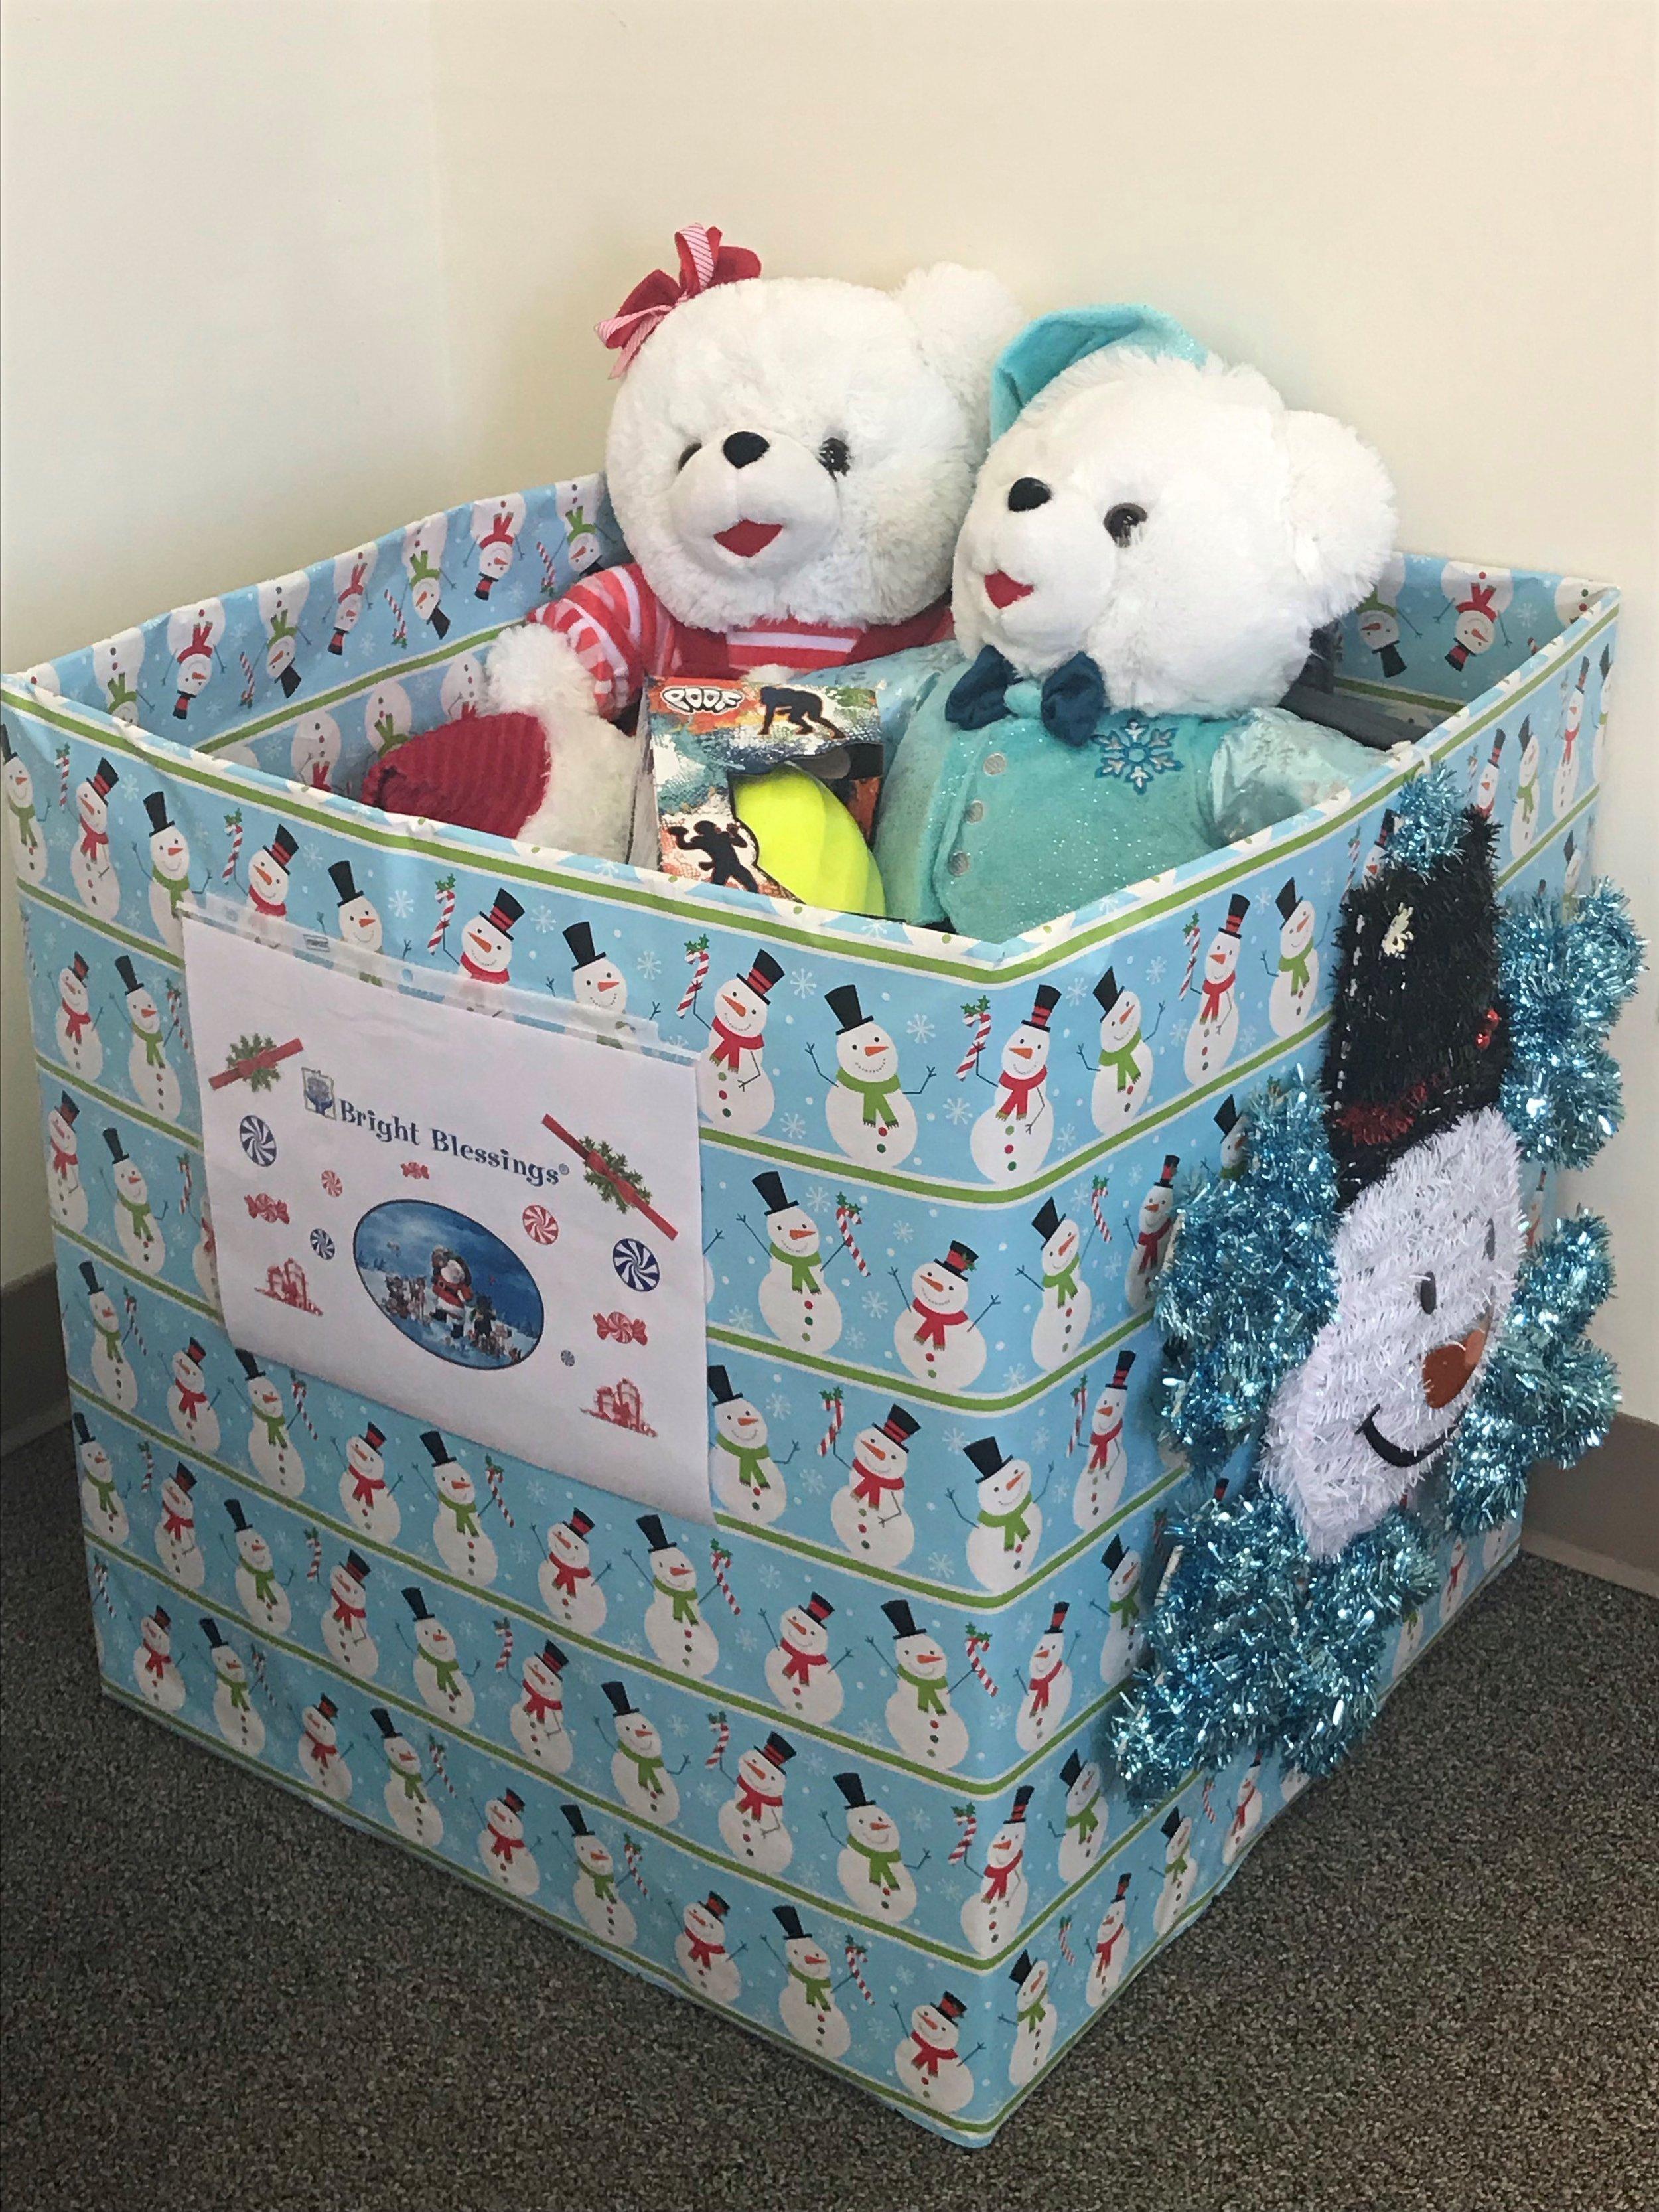 Christmas Box for the Charlotte office - Cindy Stogner.jpg